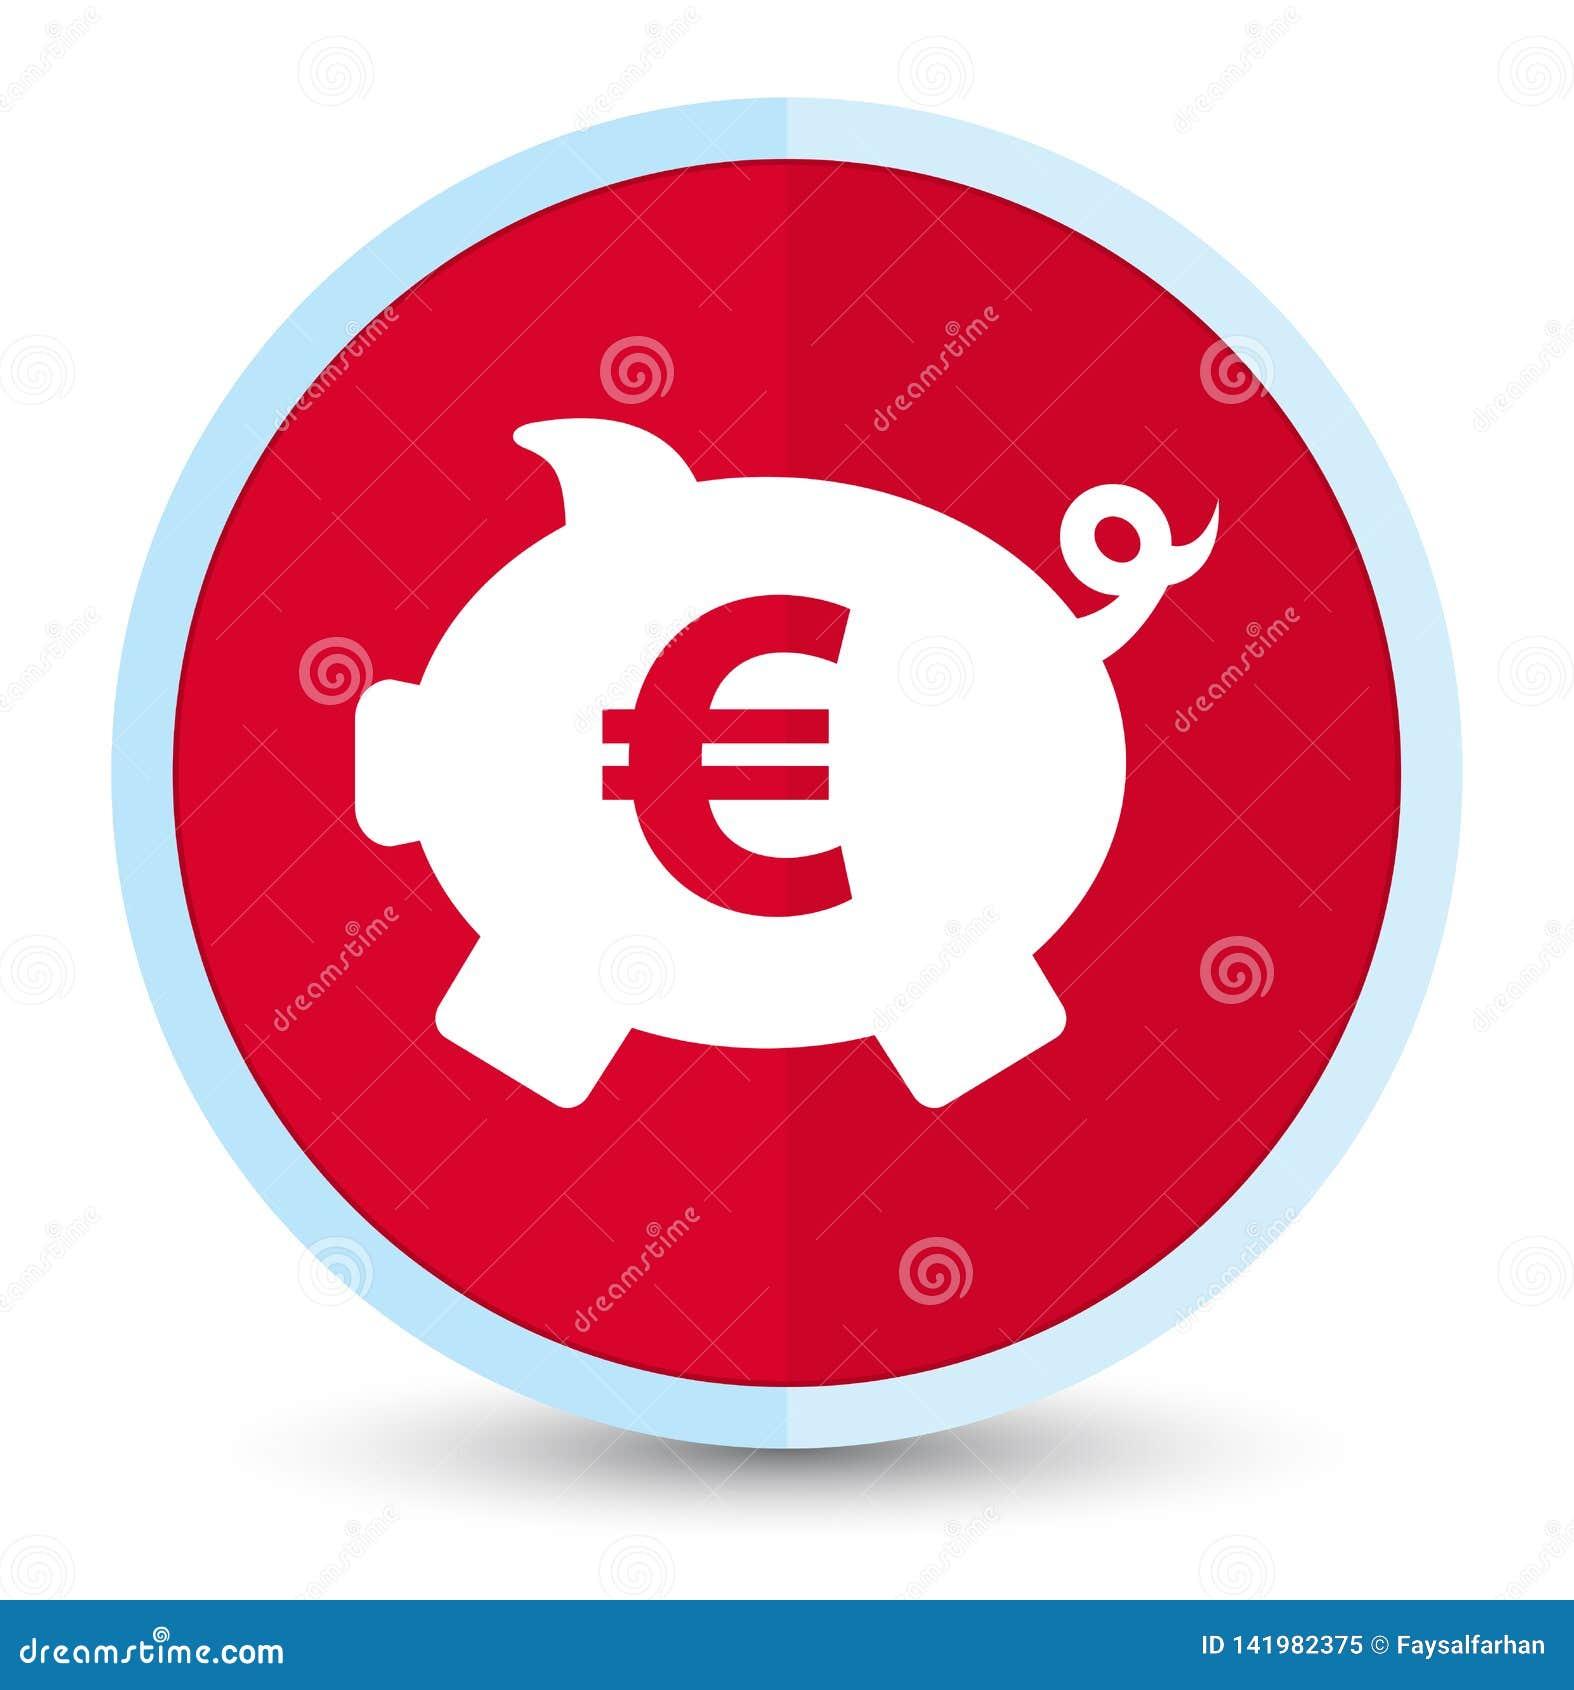 Кнопка значка знака евро копилки плоская основная красная круглая